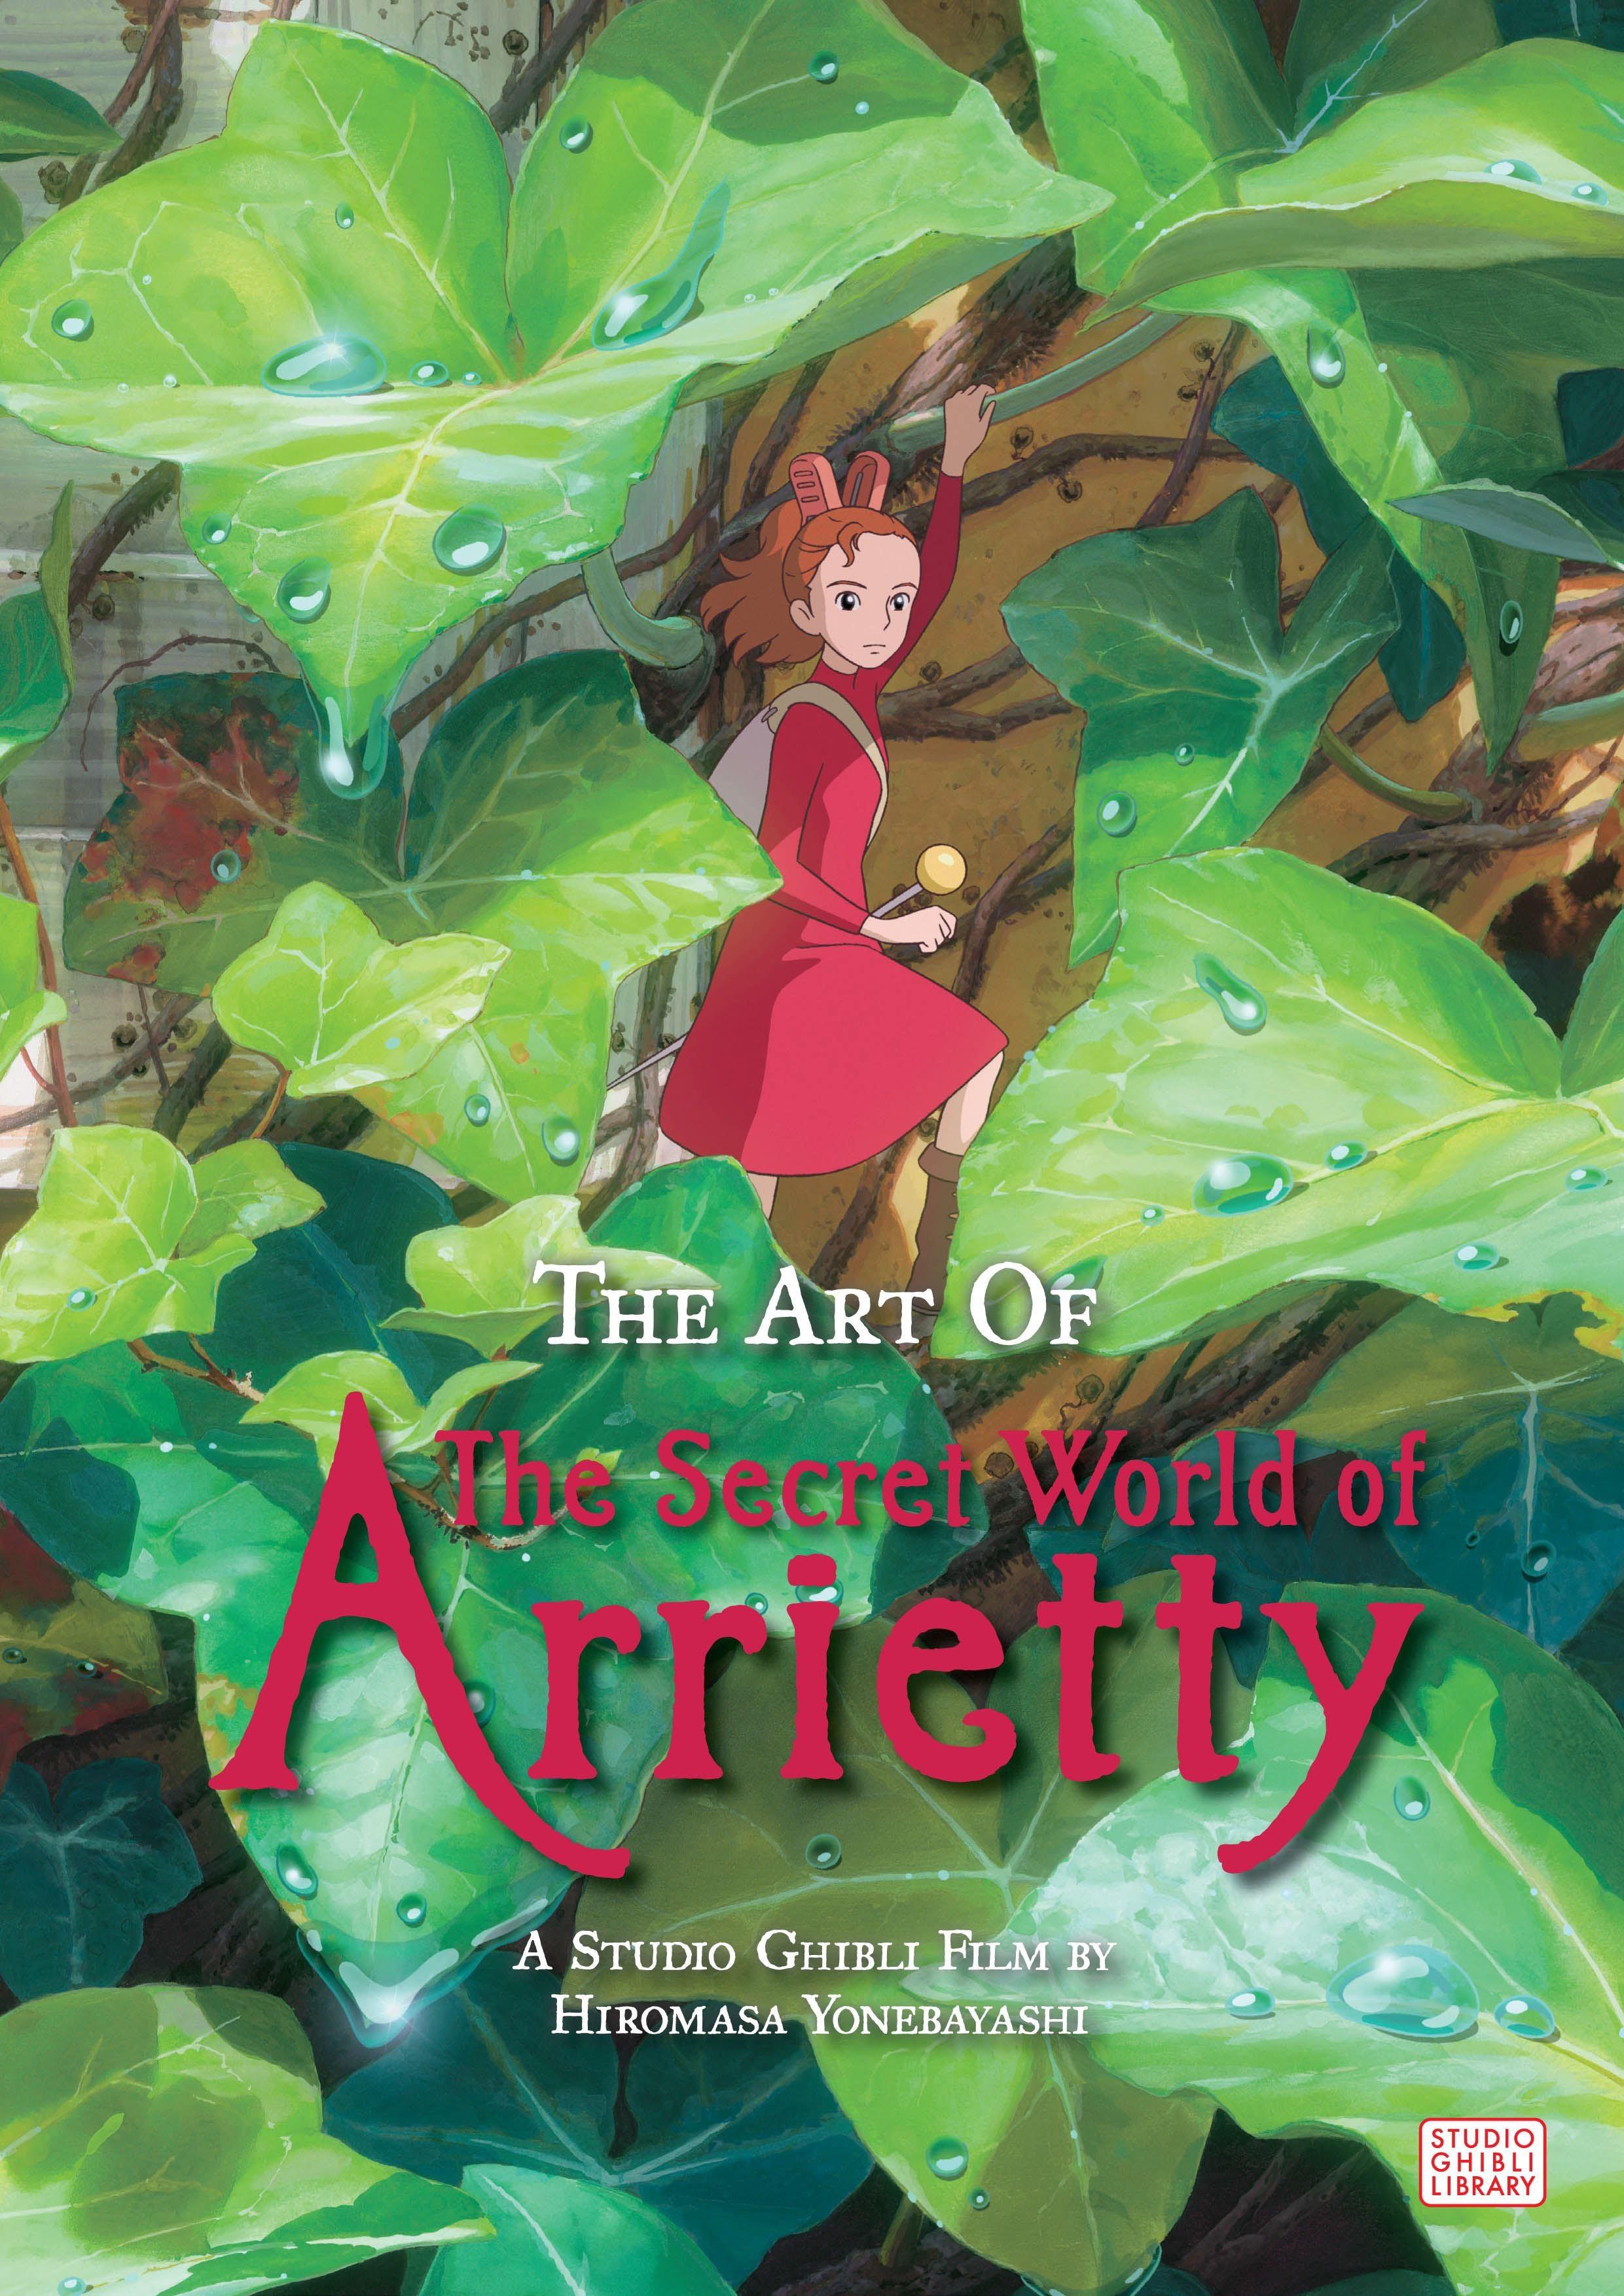 The Art of The Secret World of Arrietty by Hayao Miyazaki